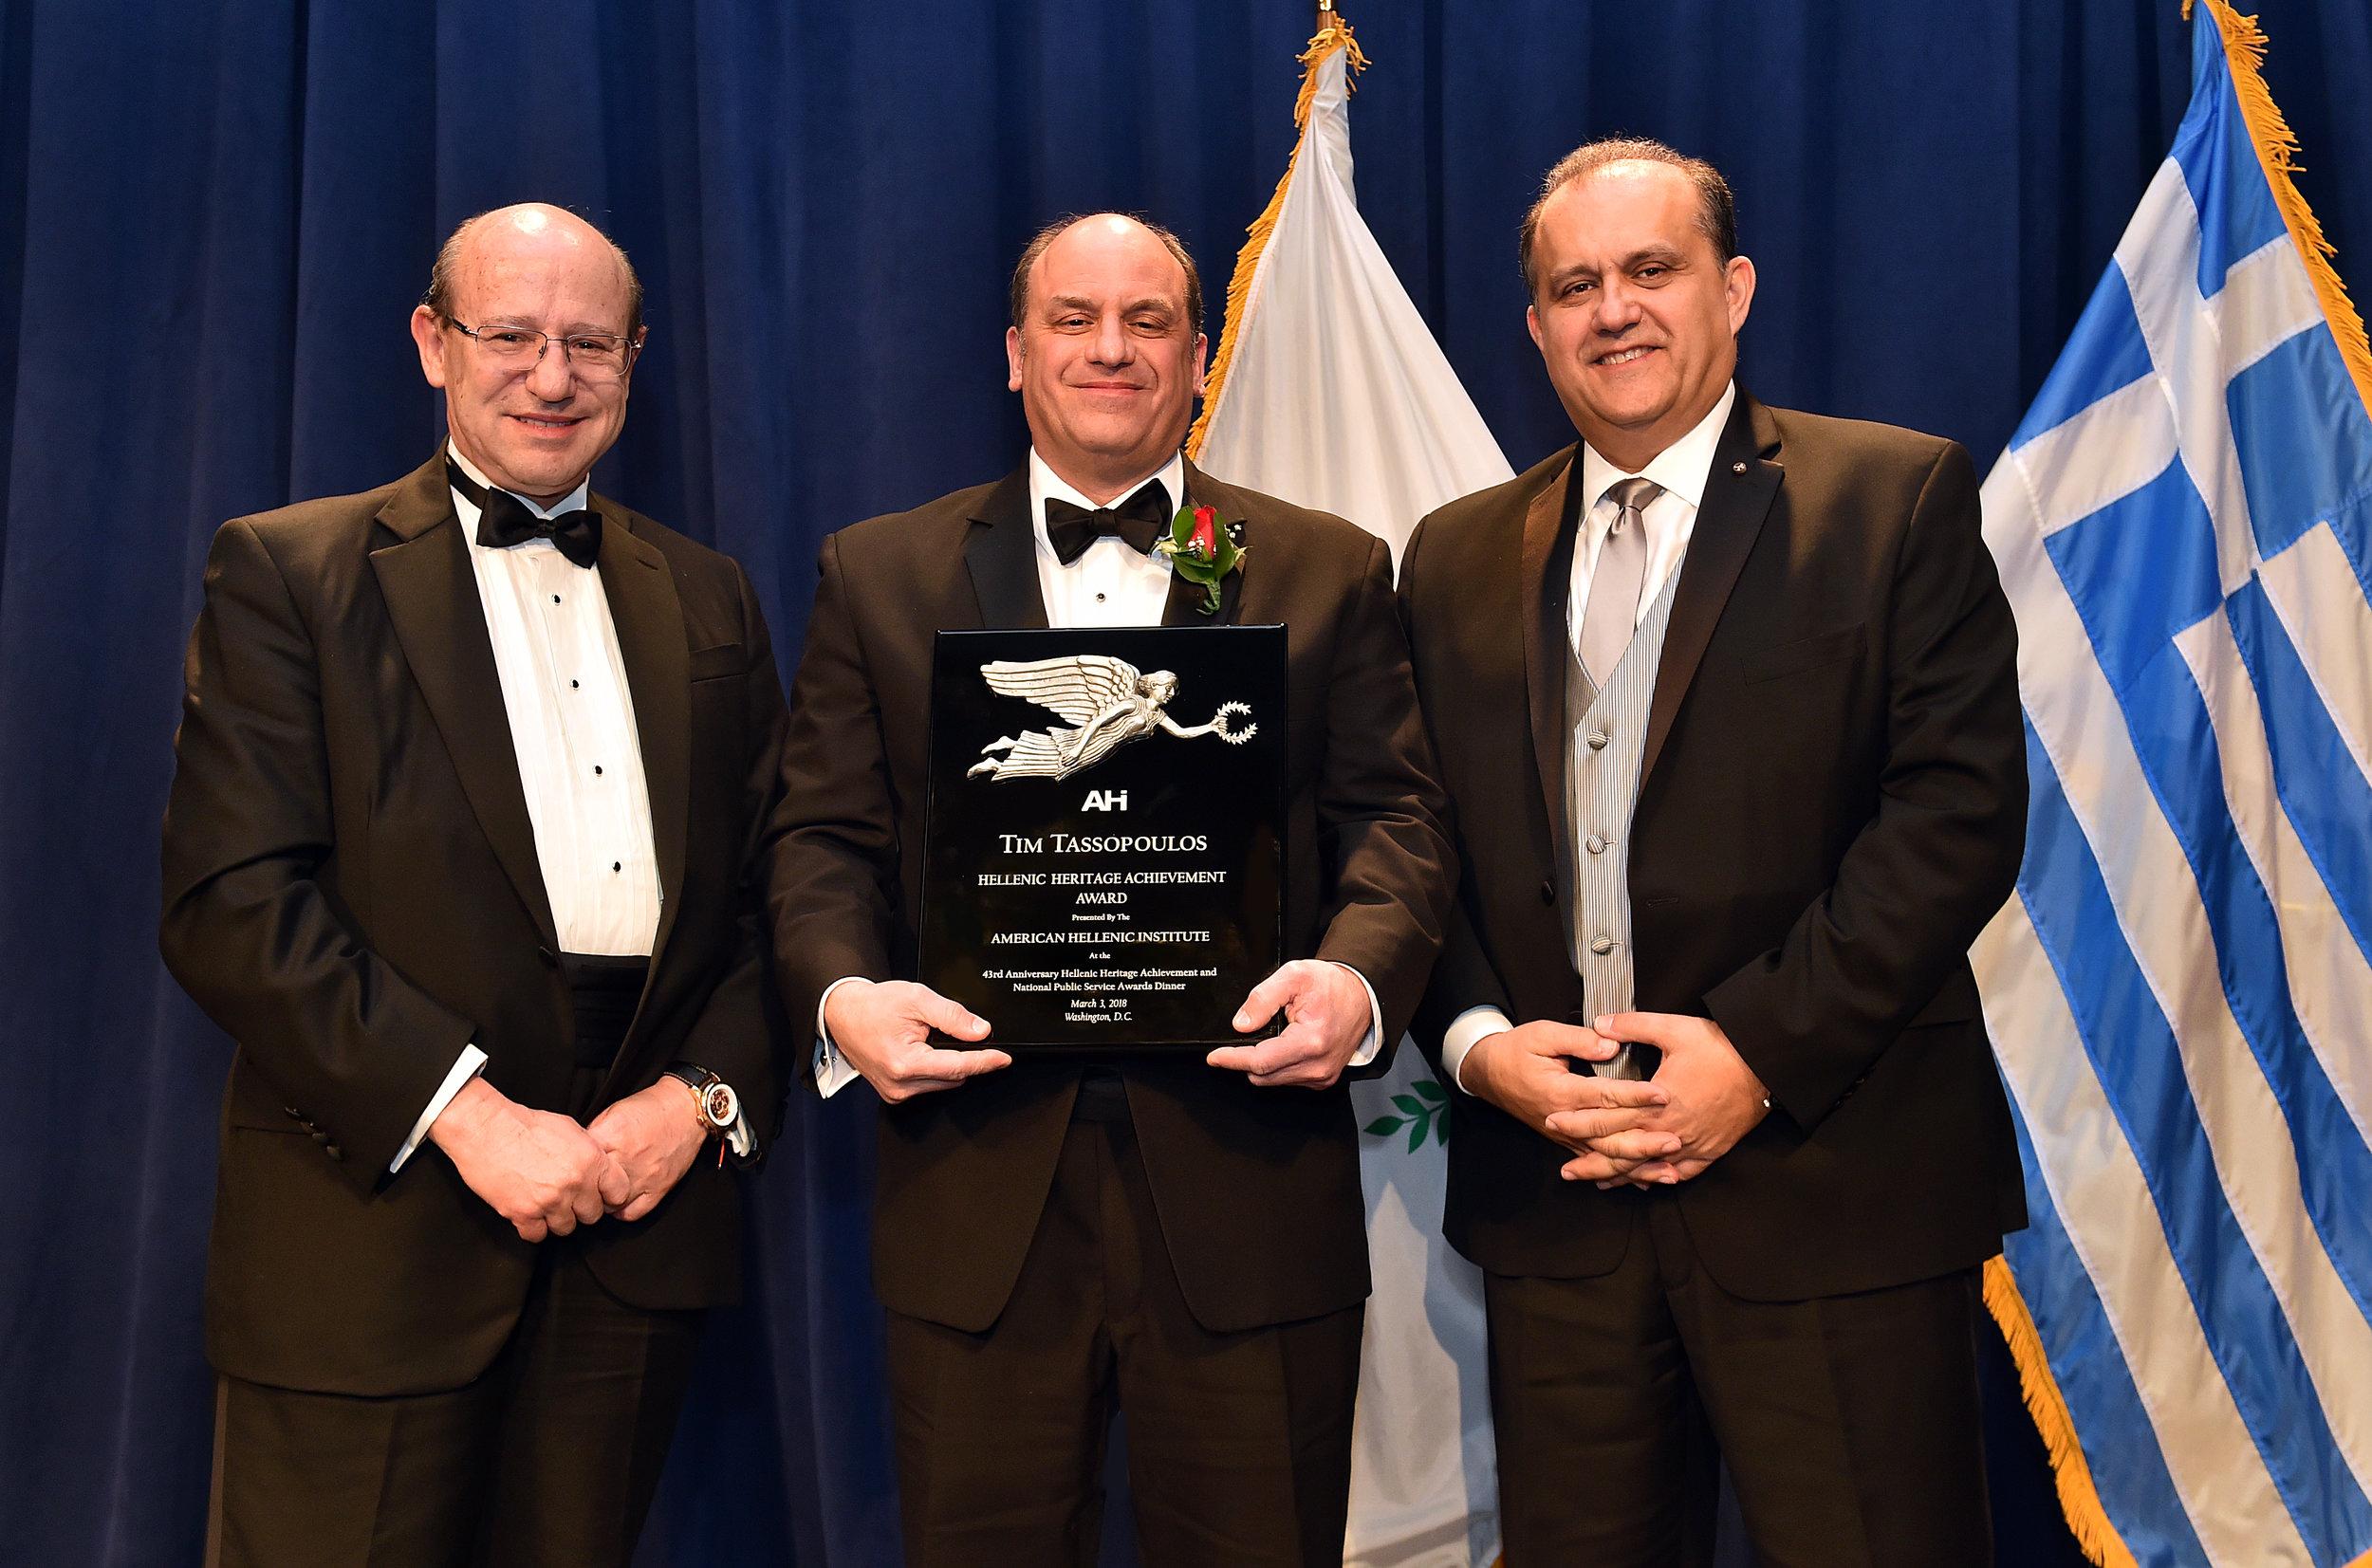 Tim Tassopoulos receives the AHI Hellenic Heritage Achievement Award.